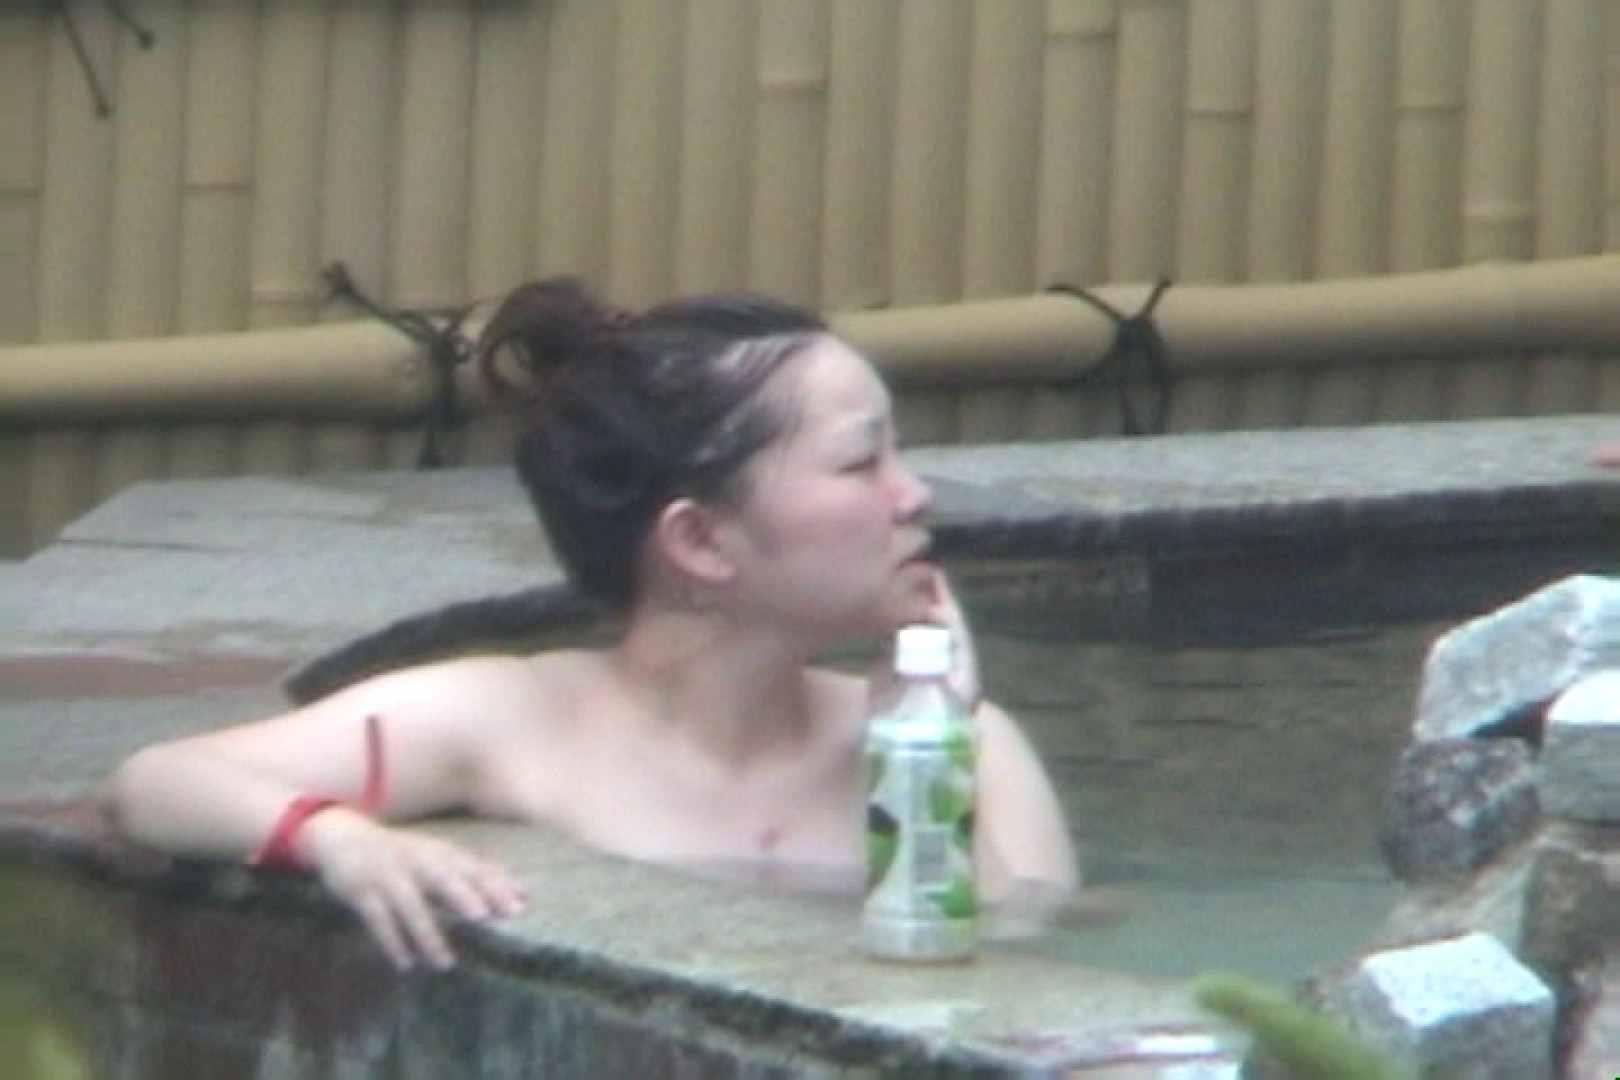 Aquaな露天風呂Vol.47【VIP限定】 盗撮   OLのエロ生活  101連発 46